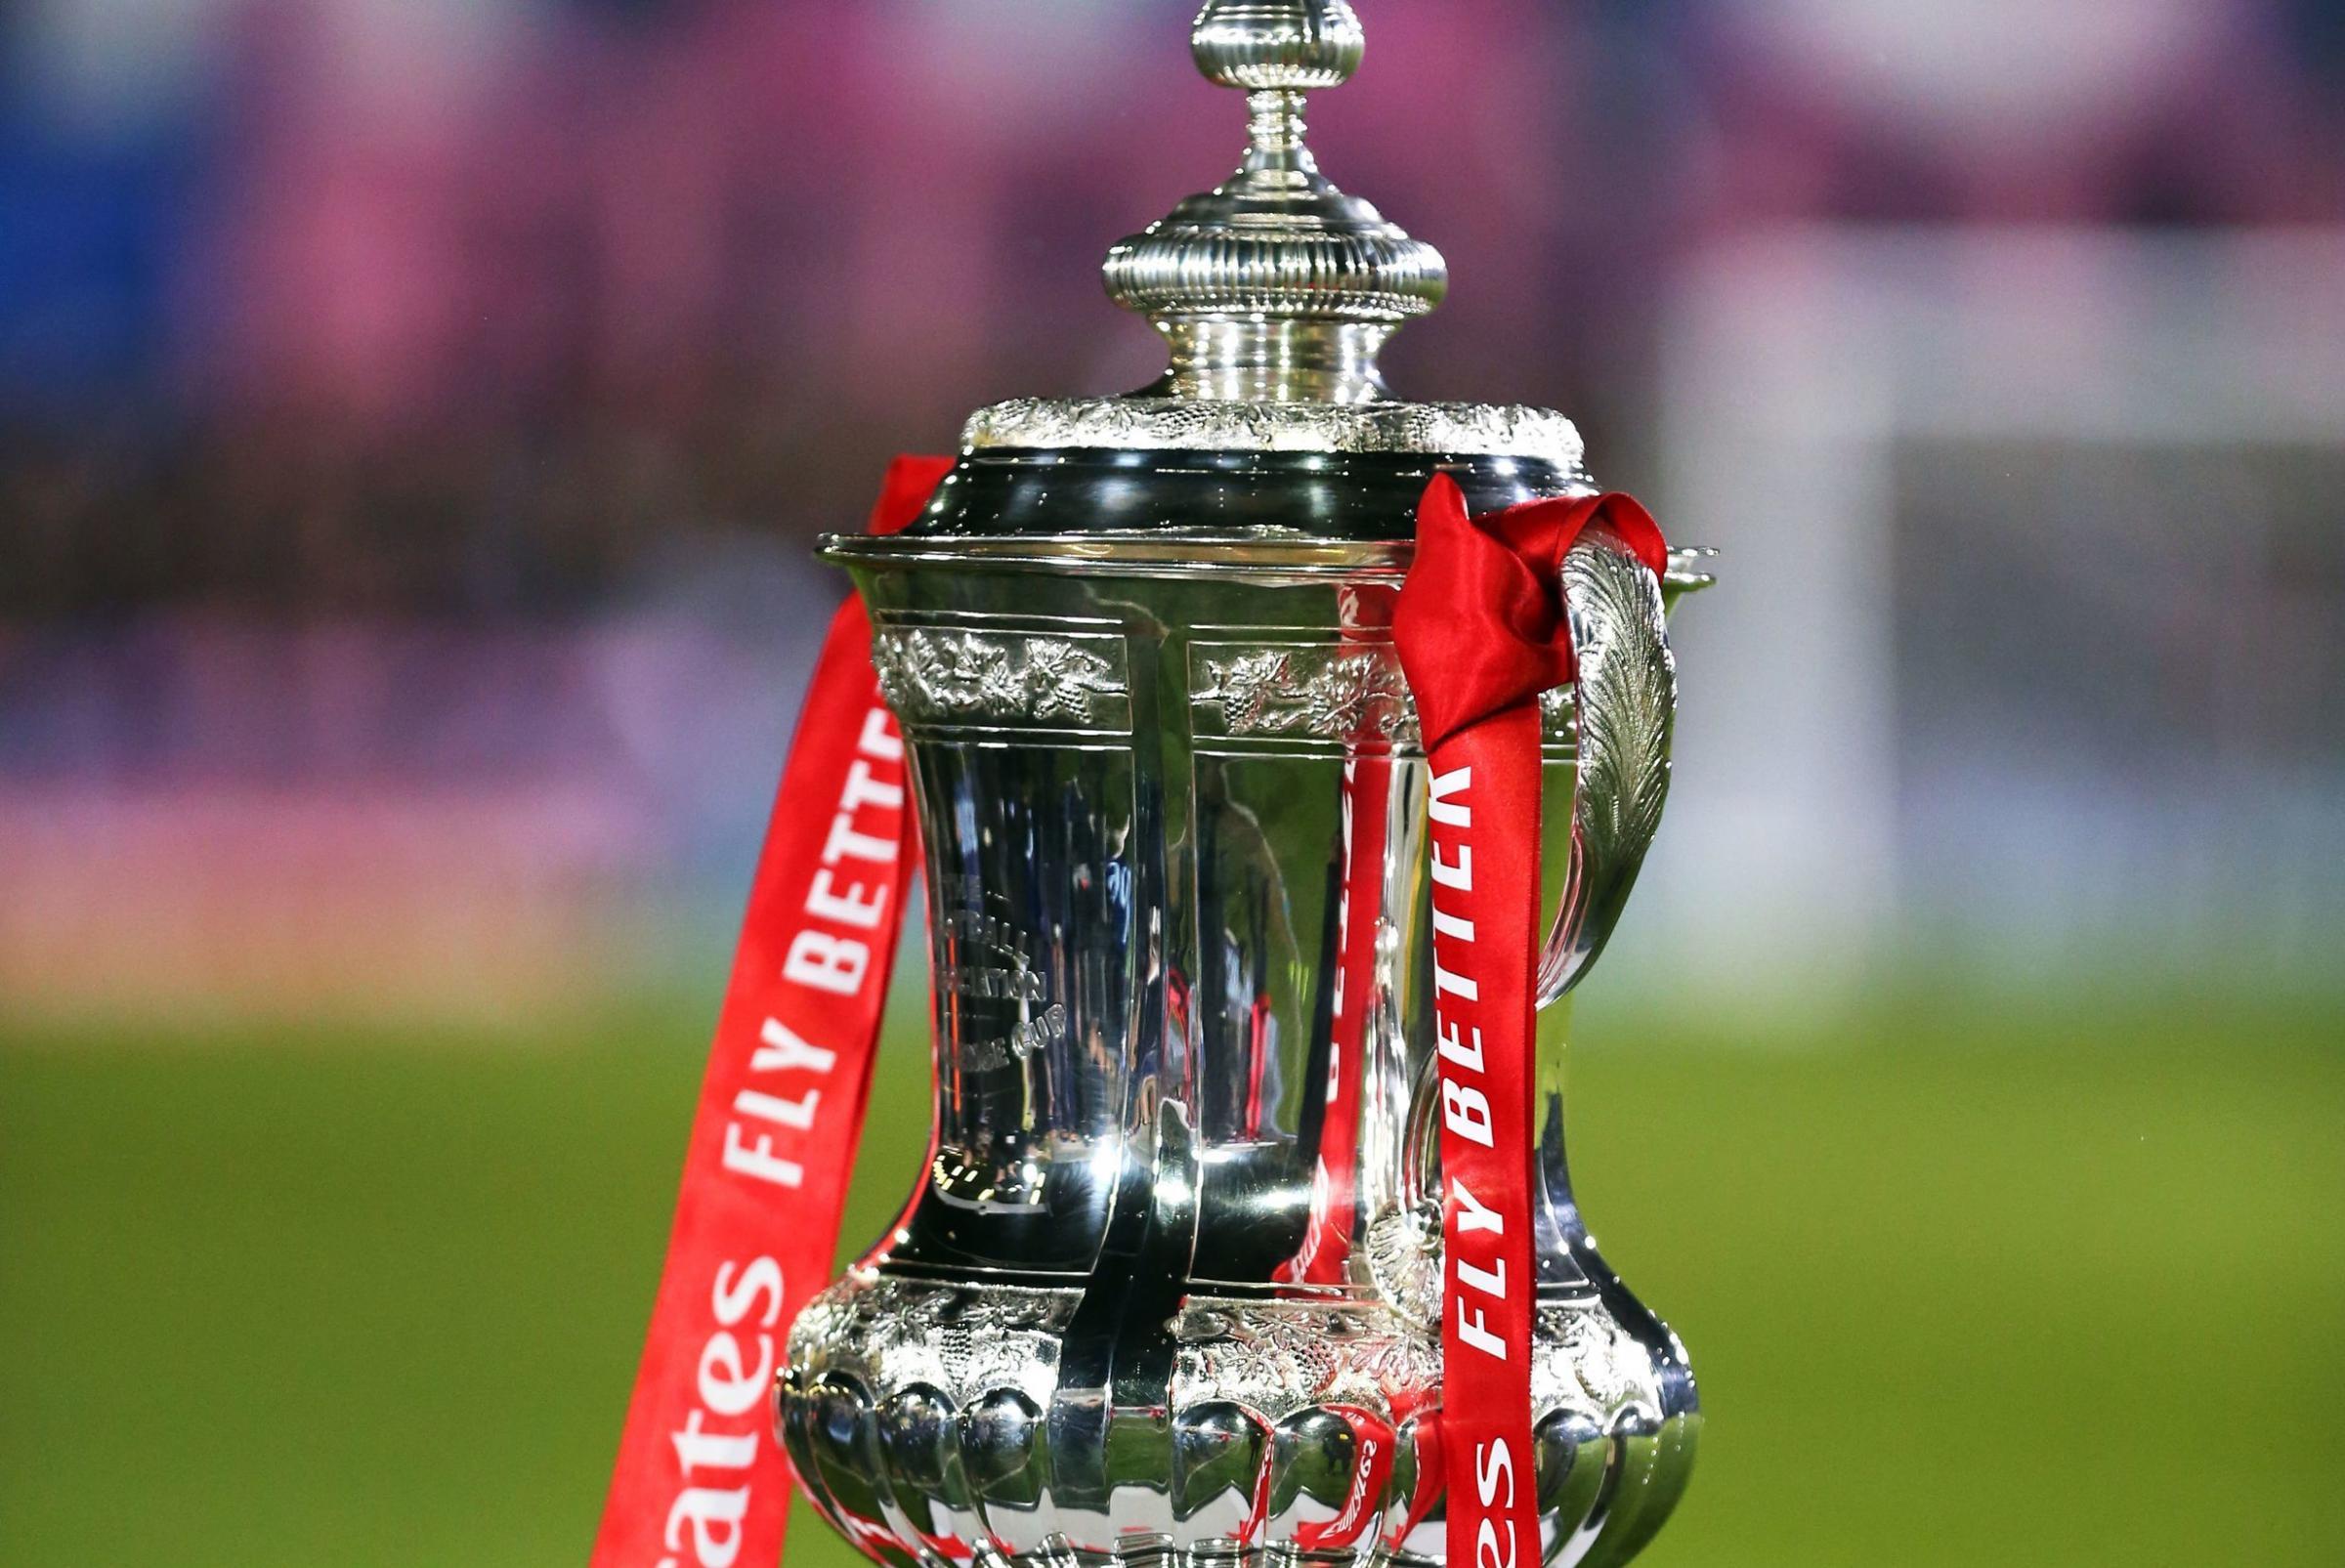 Saints set to host Shrewsbury in FA Cup third round